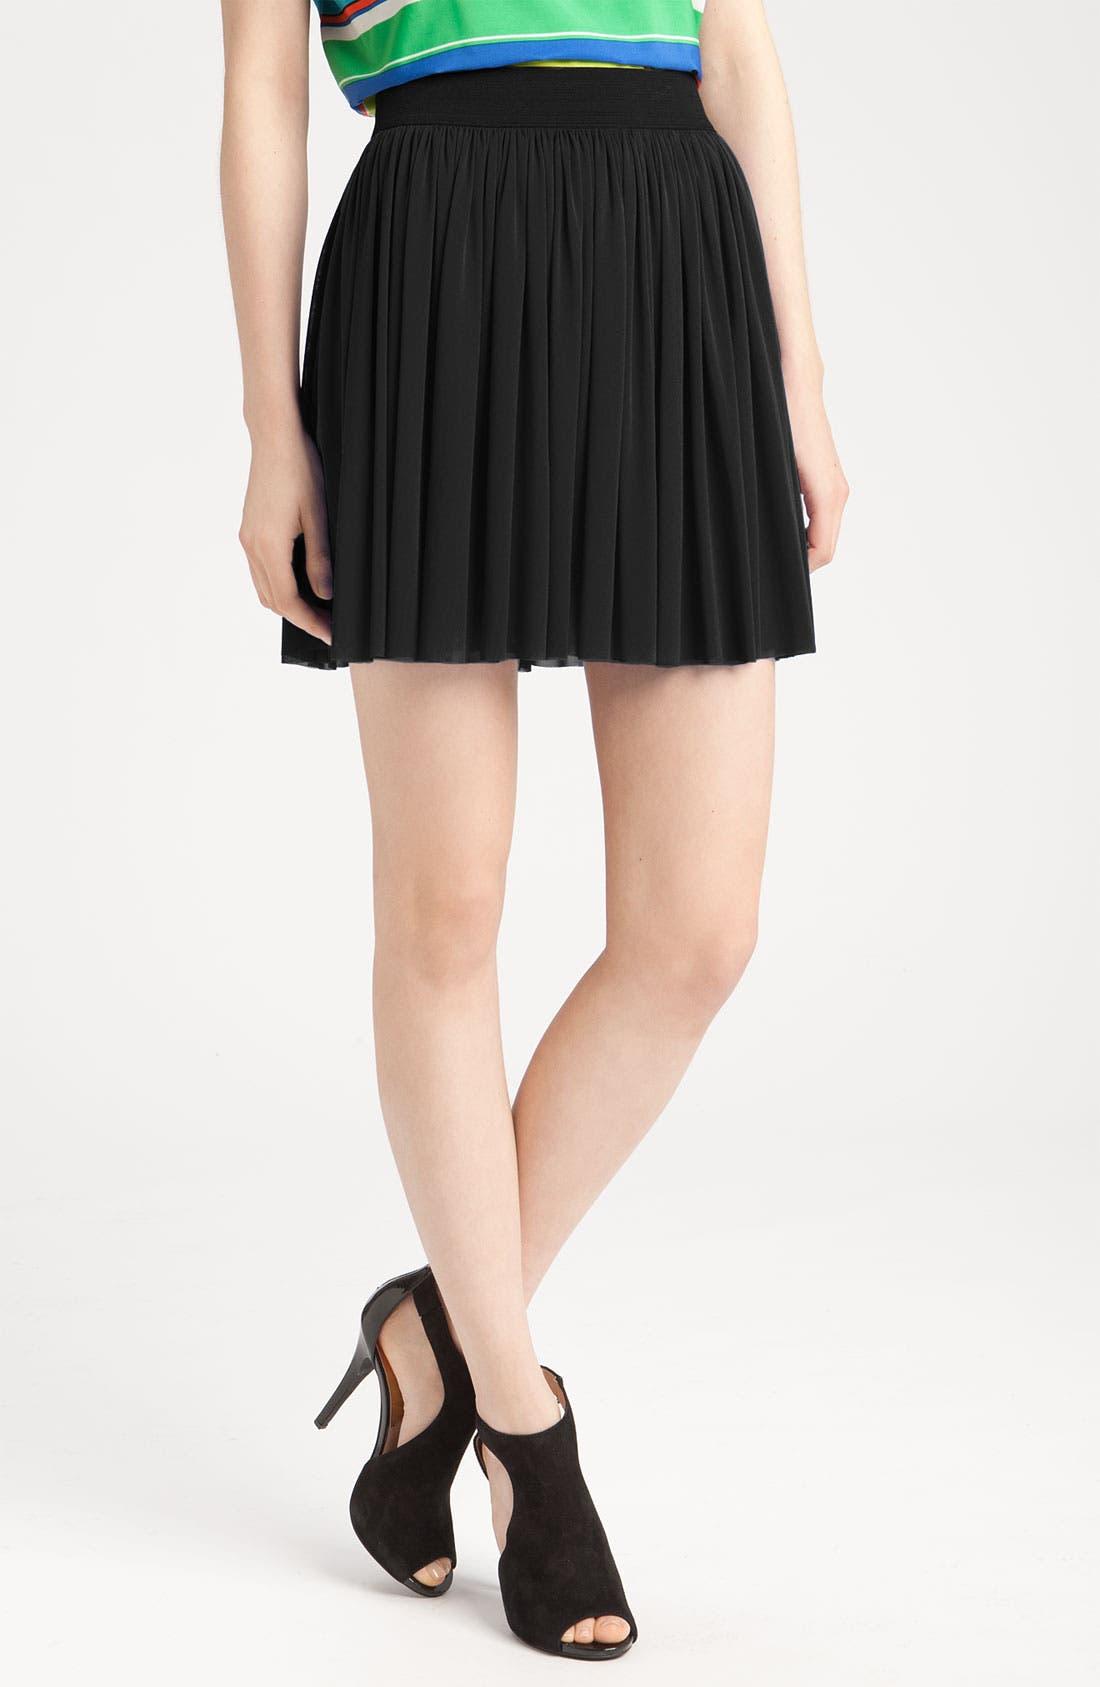 Main Image - Vince Camuto Mesh Skirt with Elastic Waistband